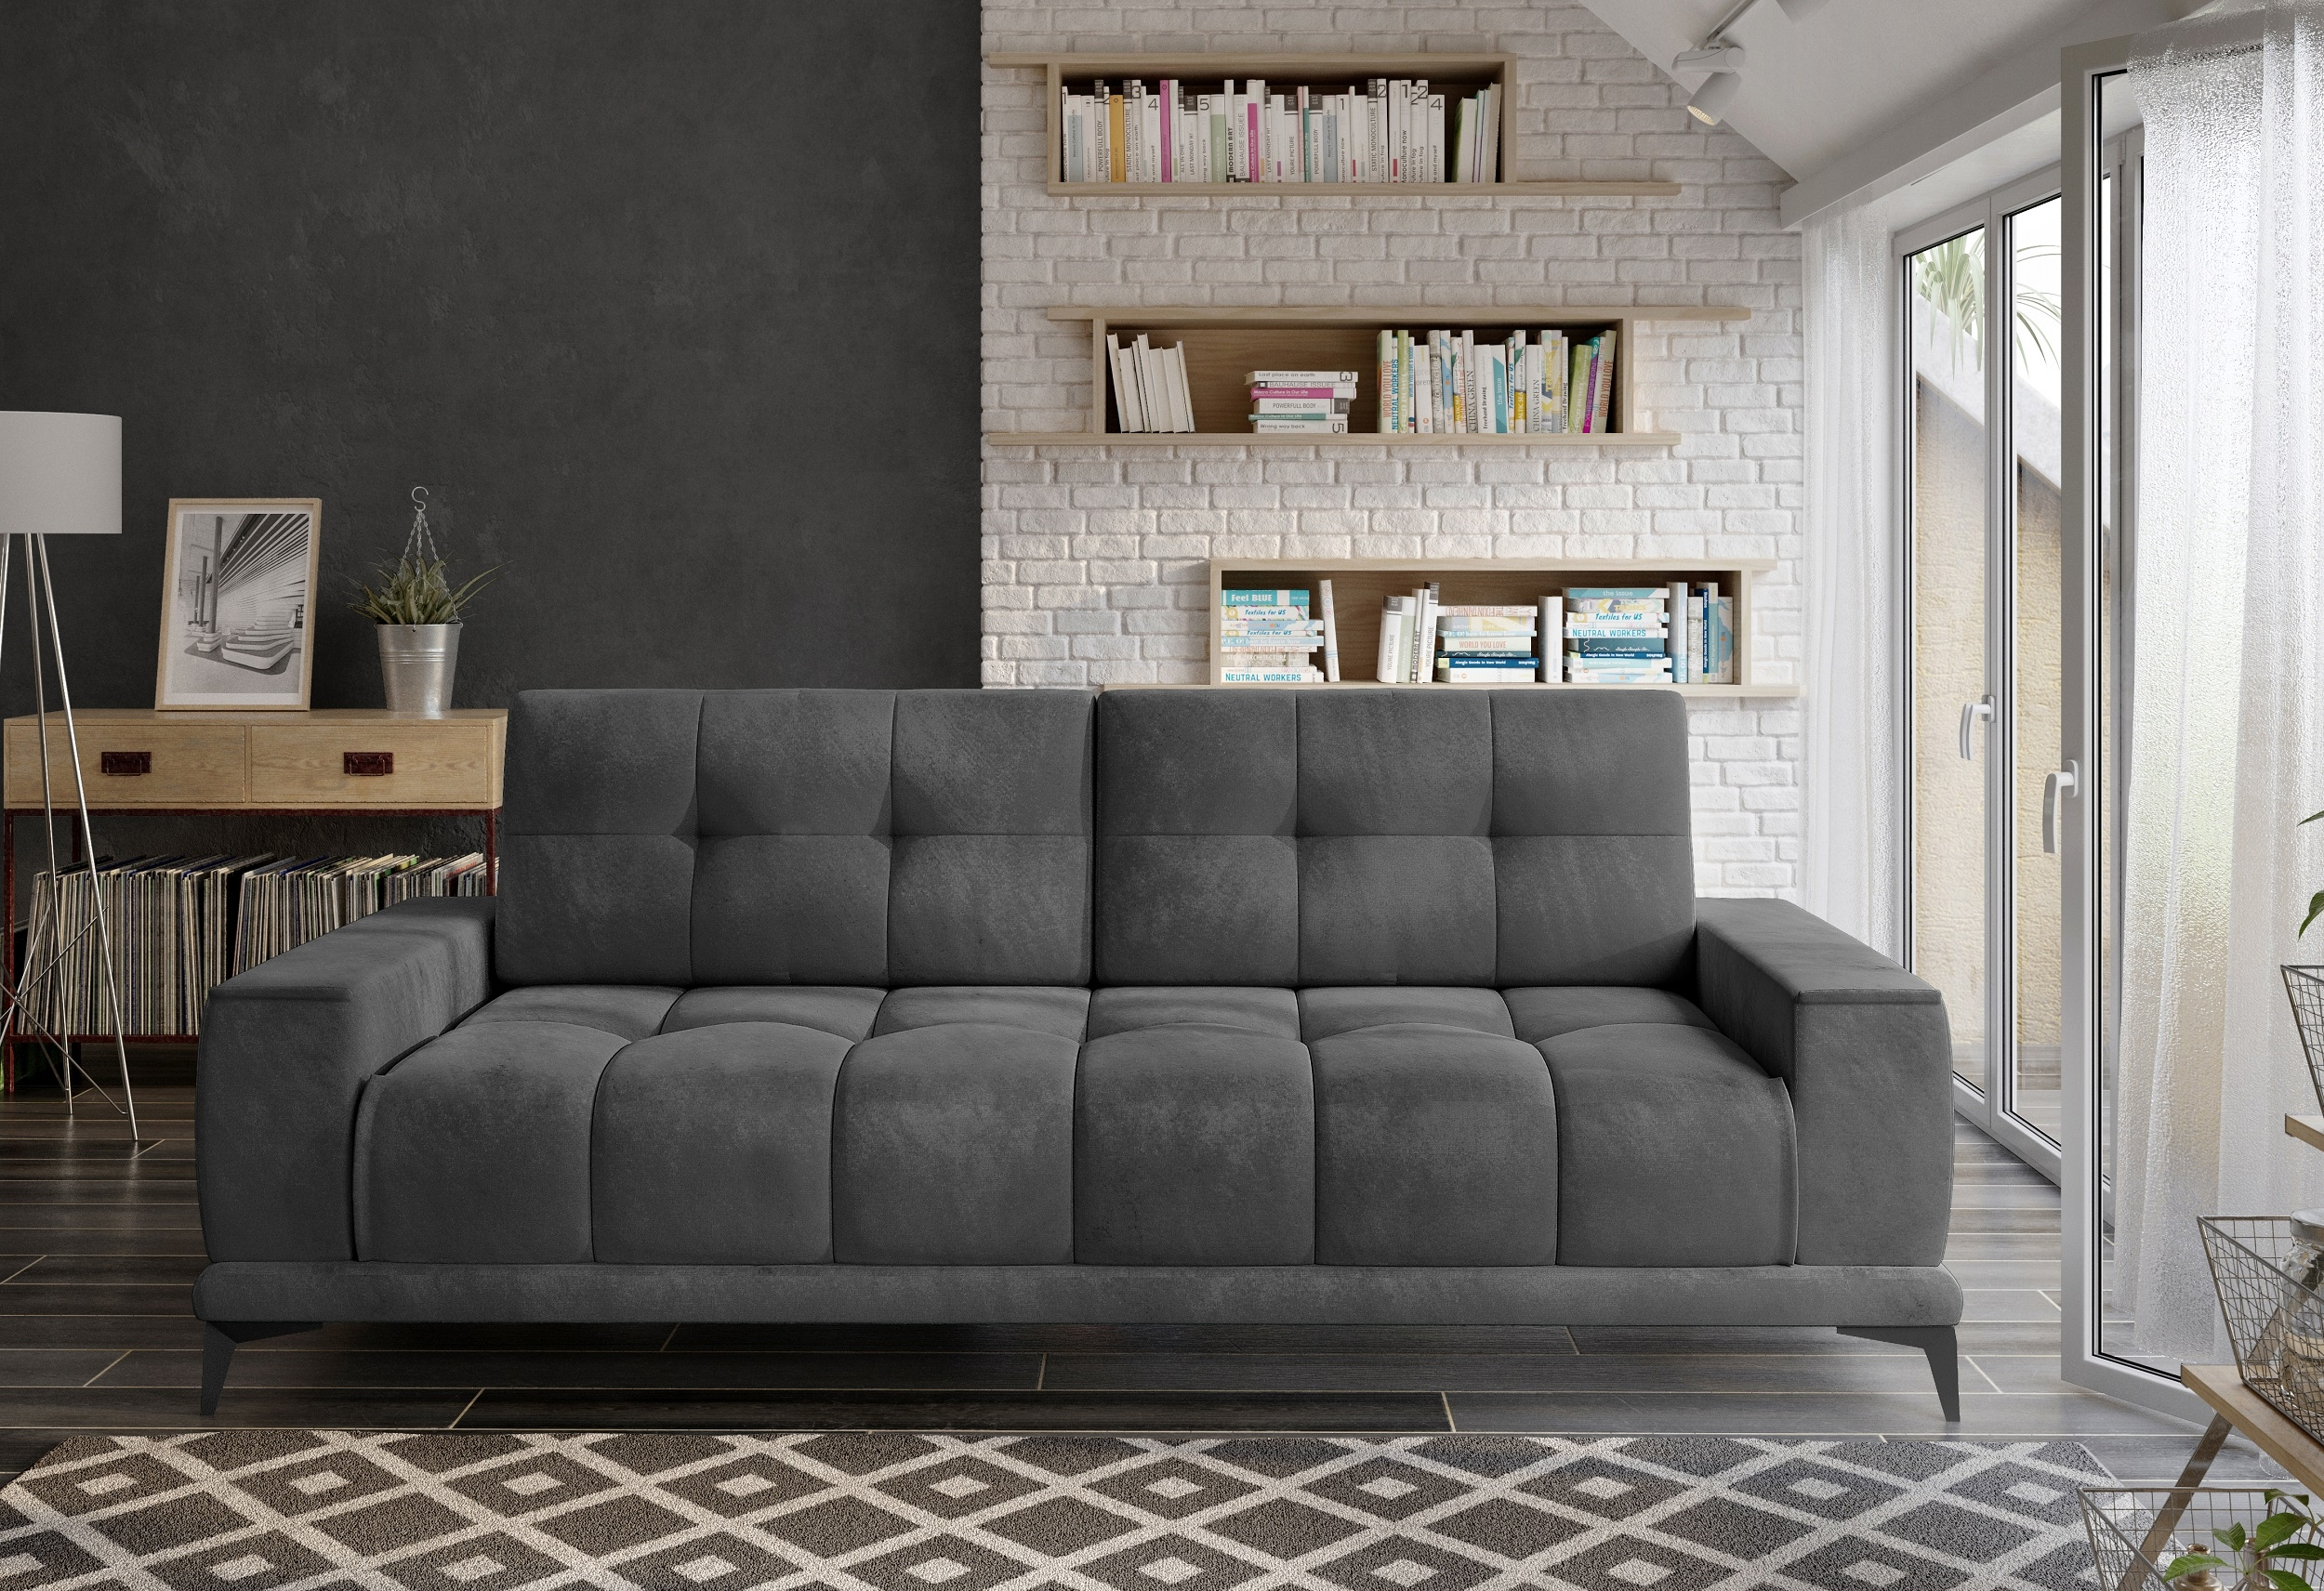 Canapea extensibila cu lada de depozitare, tapitata cu stofa 3 locuri Mamba Gri, l248xA104xH91 cm